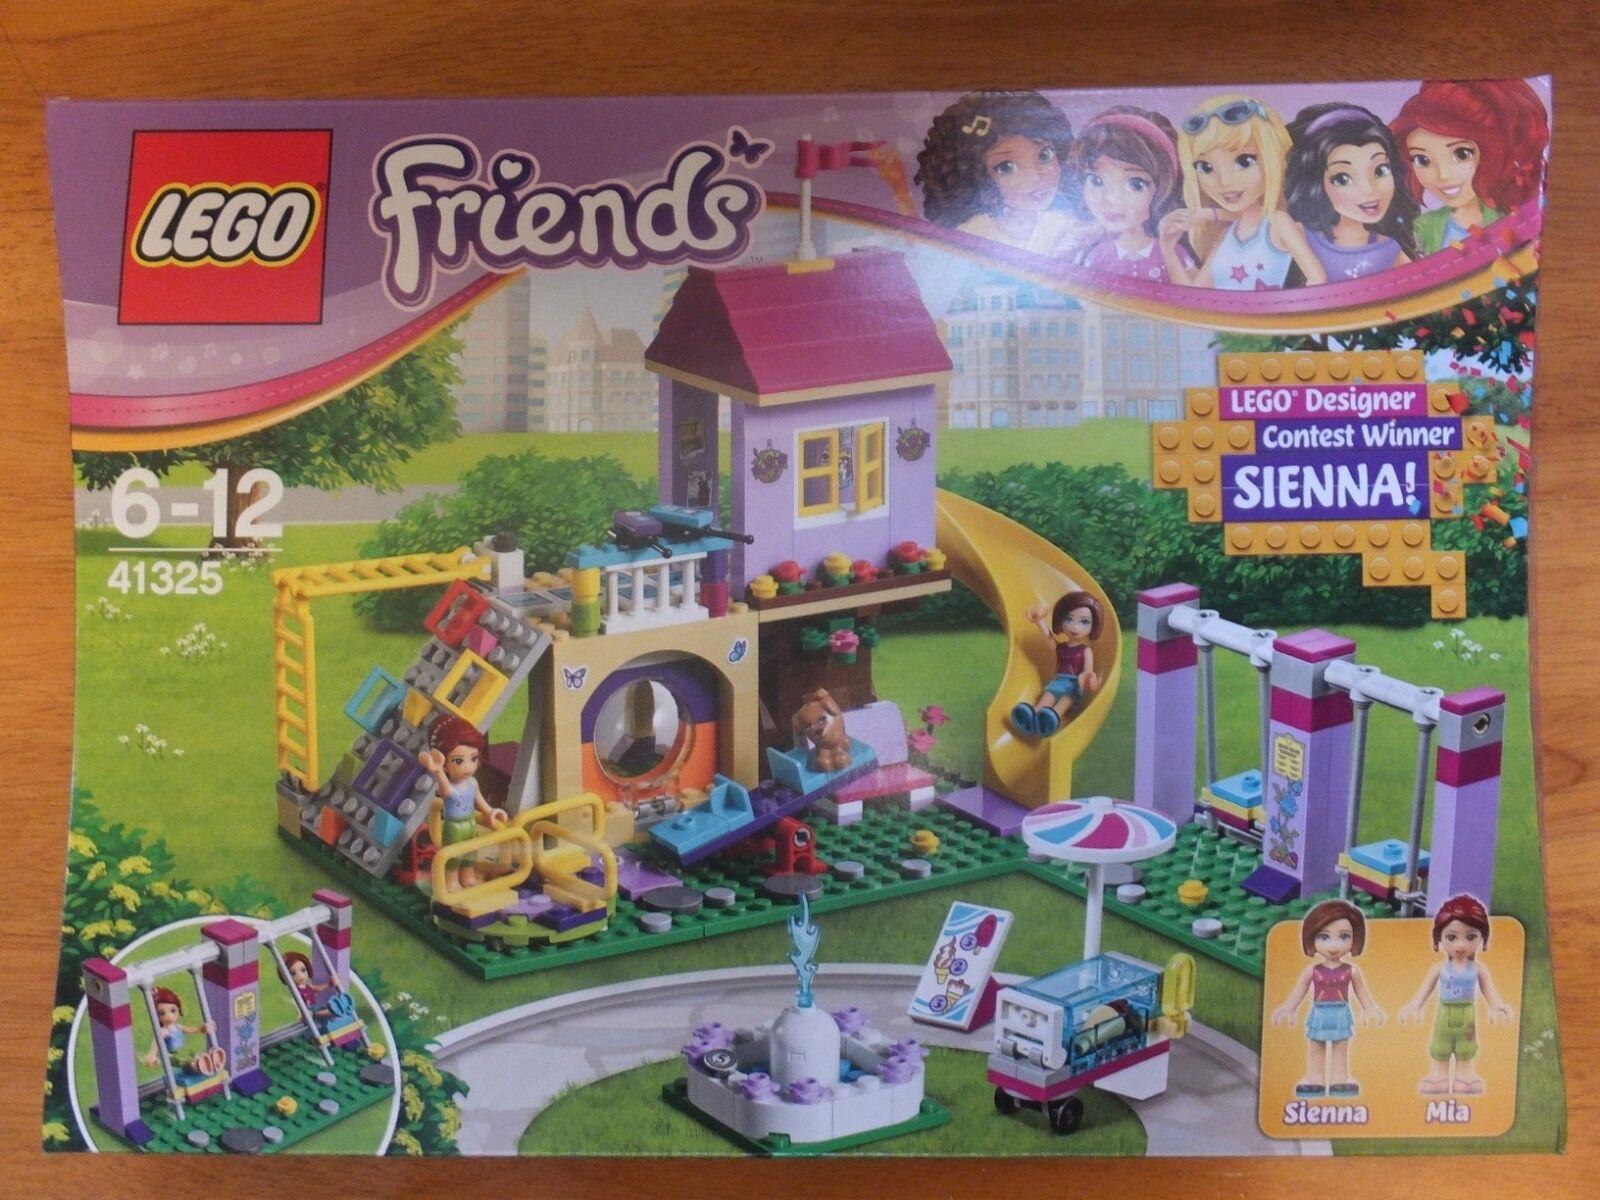 Lego 41325 Friends Heartlake City Playground Set